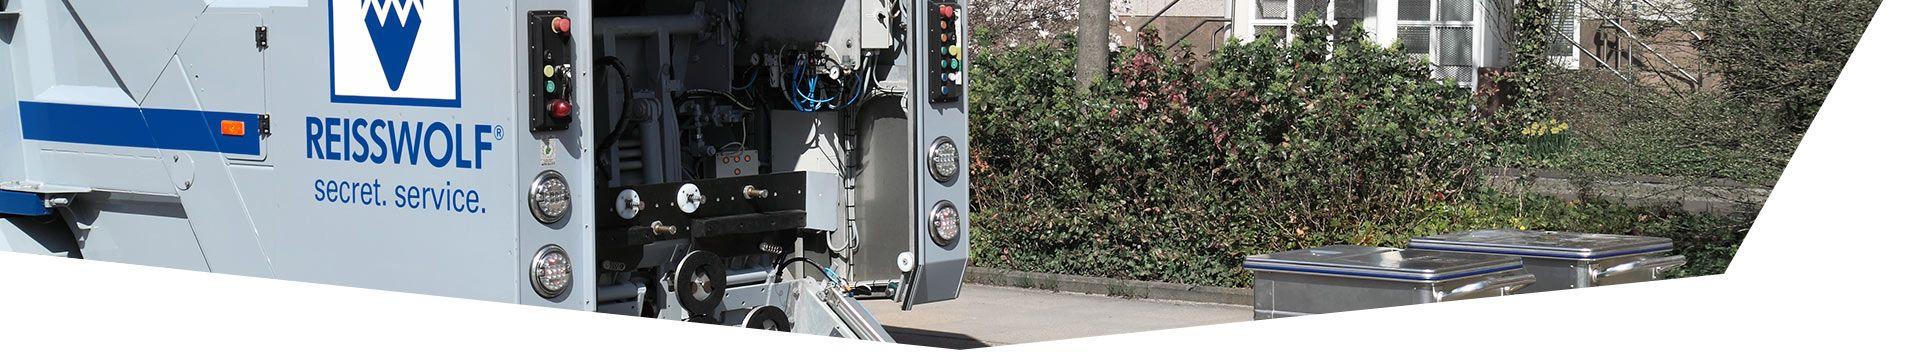 csm_header_safety_car_1920x352_180306baa5